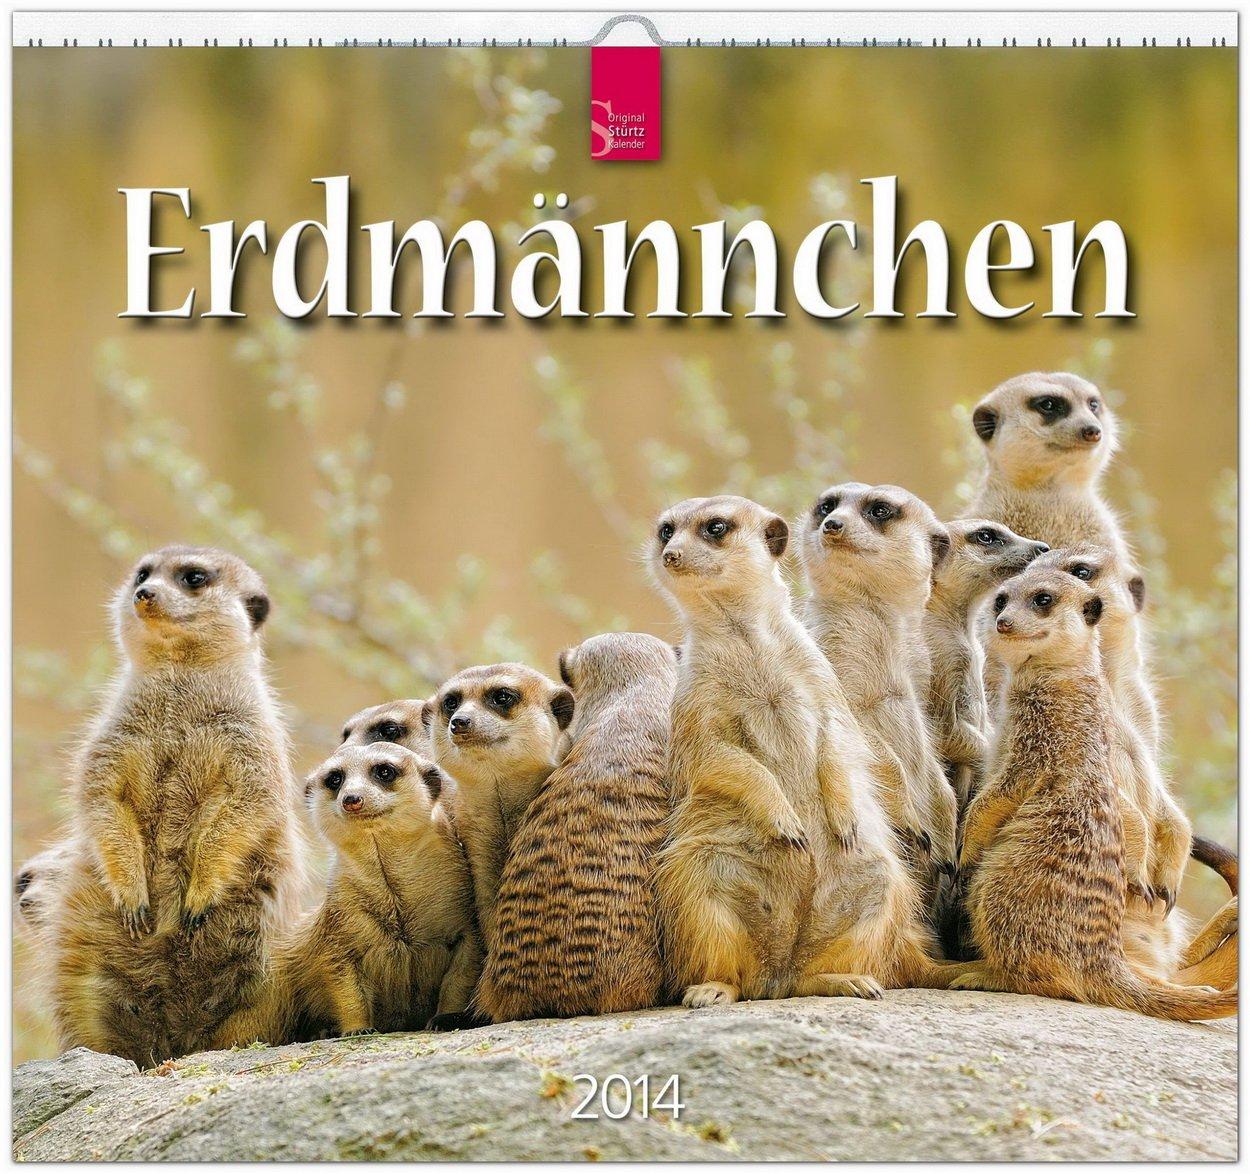 Erdmännchen 2014: Original Stürtz-Kalender - Mittelformat-Kalender 33 x 31 cm [Spiralbindung]